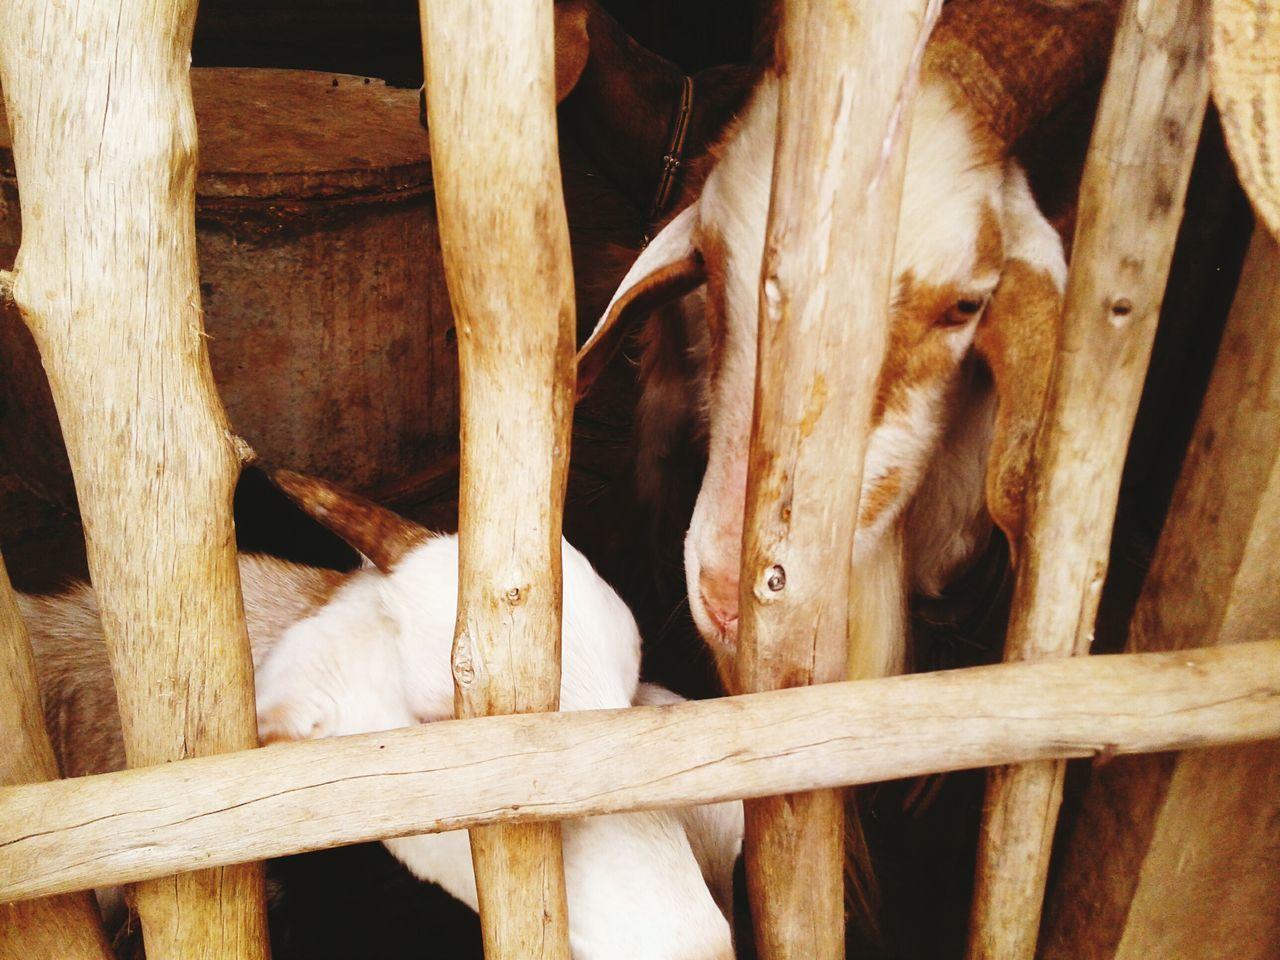 animal themes, mammal, domestic animals, livestock, no people, close-up, indoors, day, nature